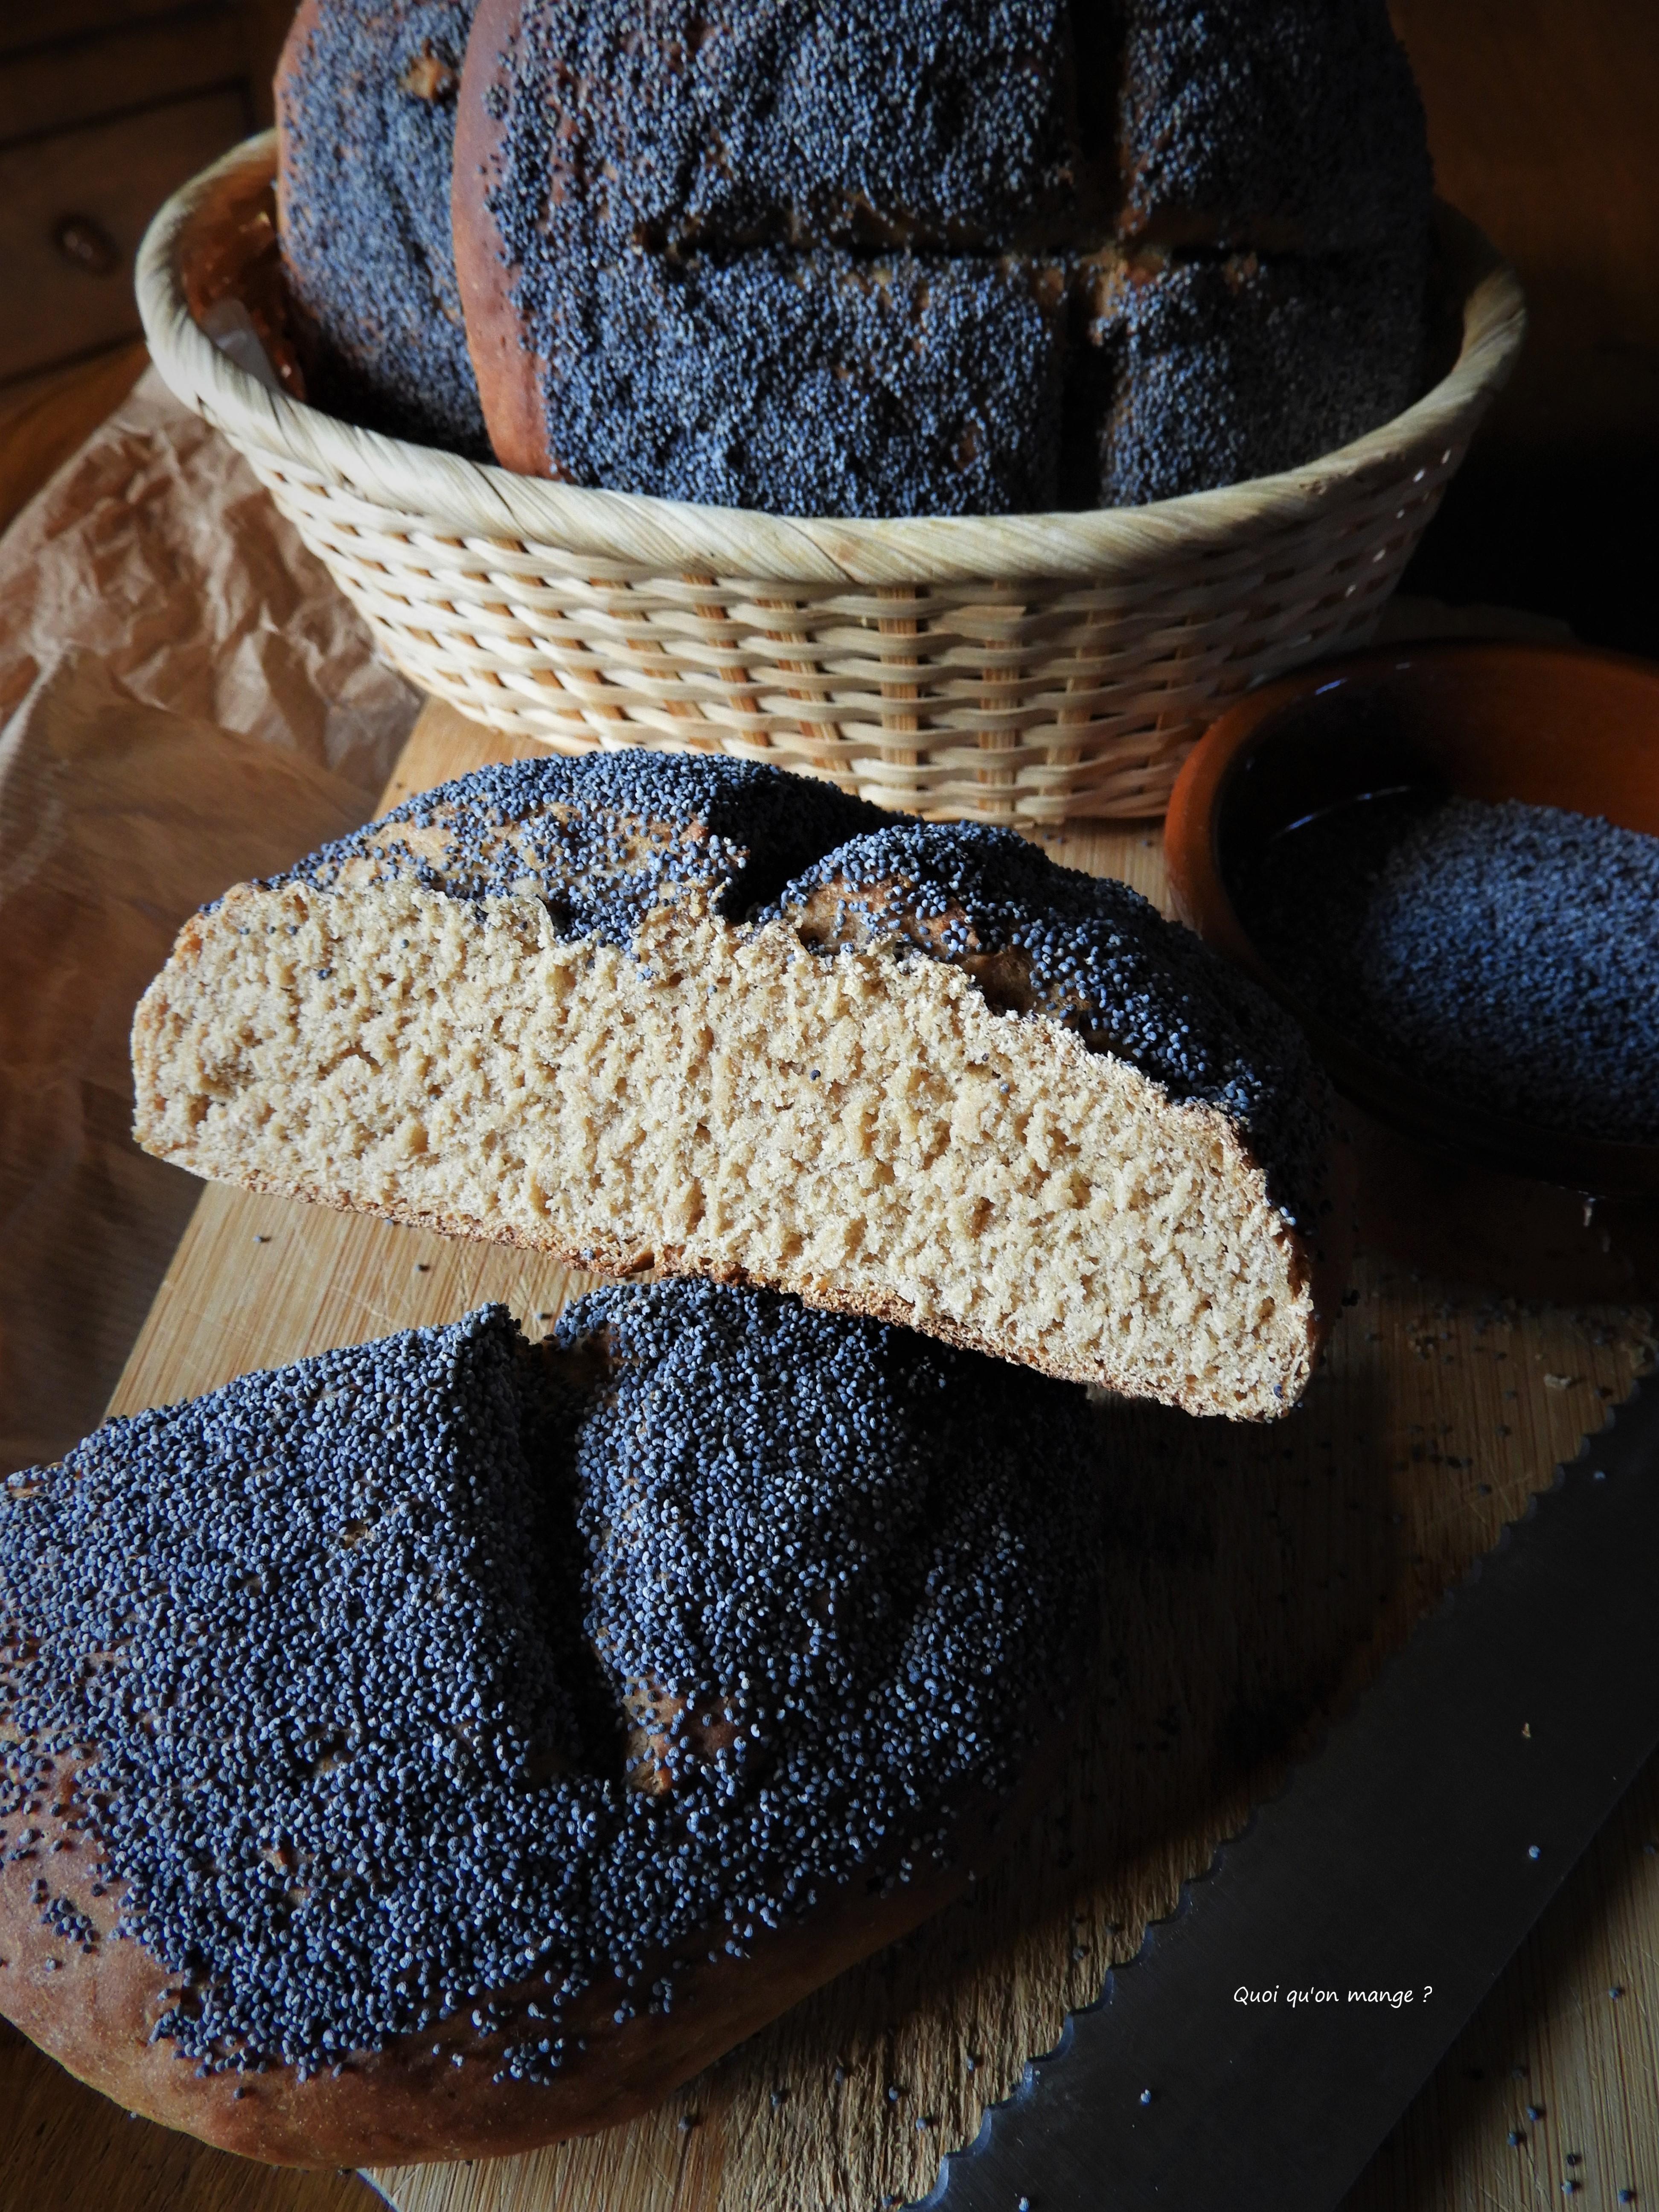 Ekmek, pain turc au pavot